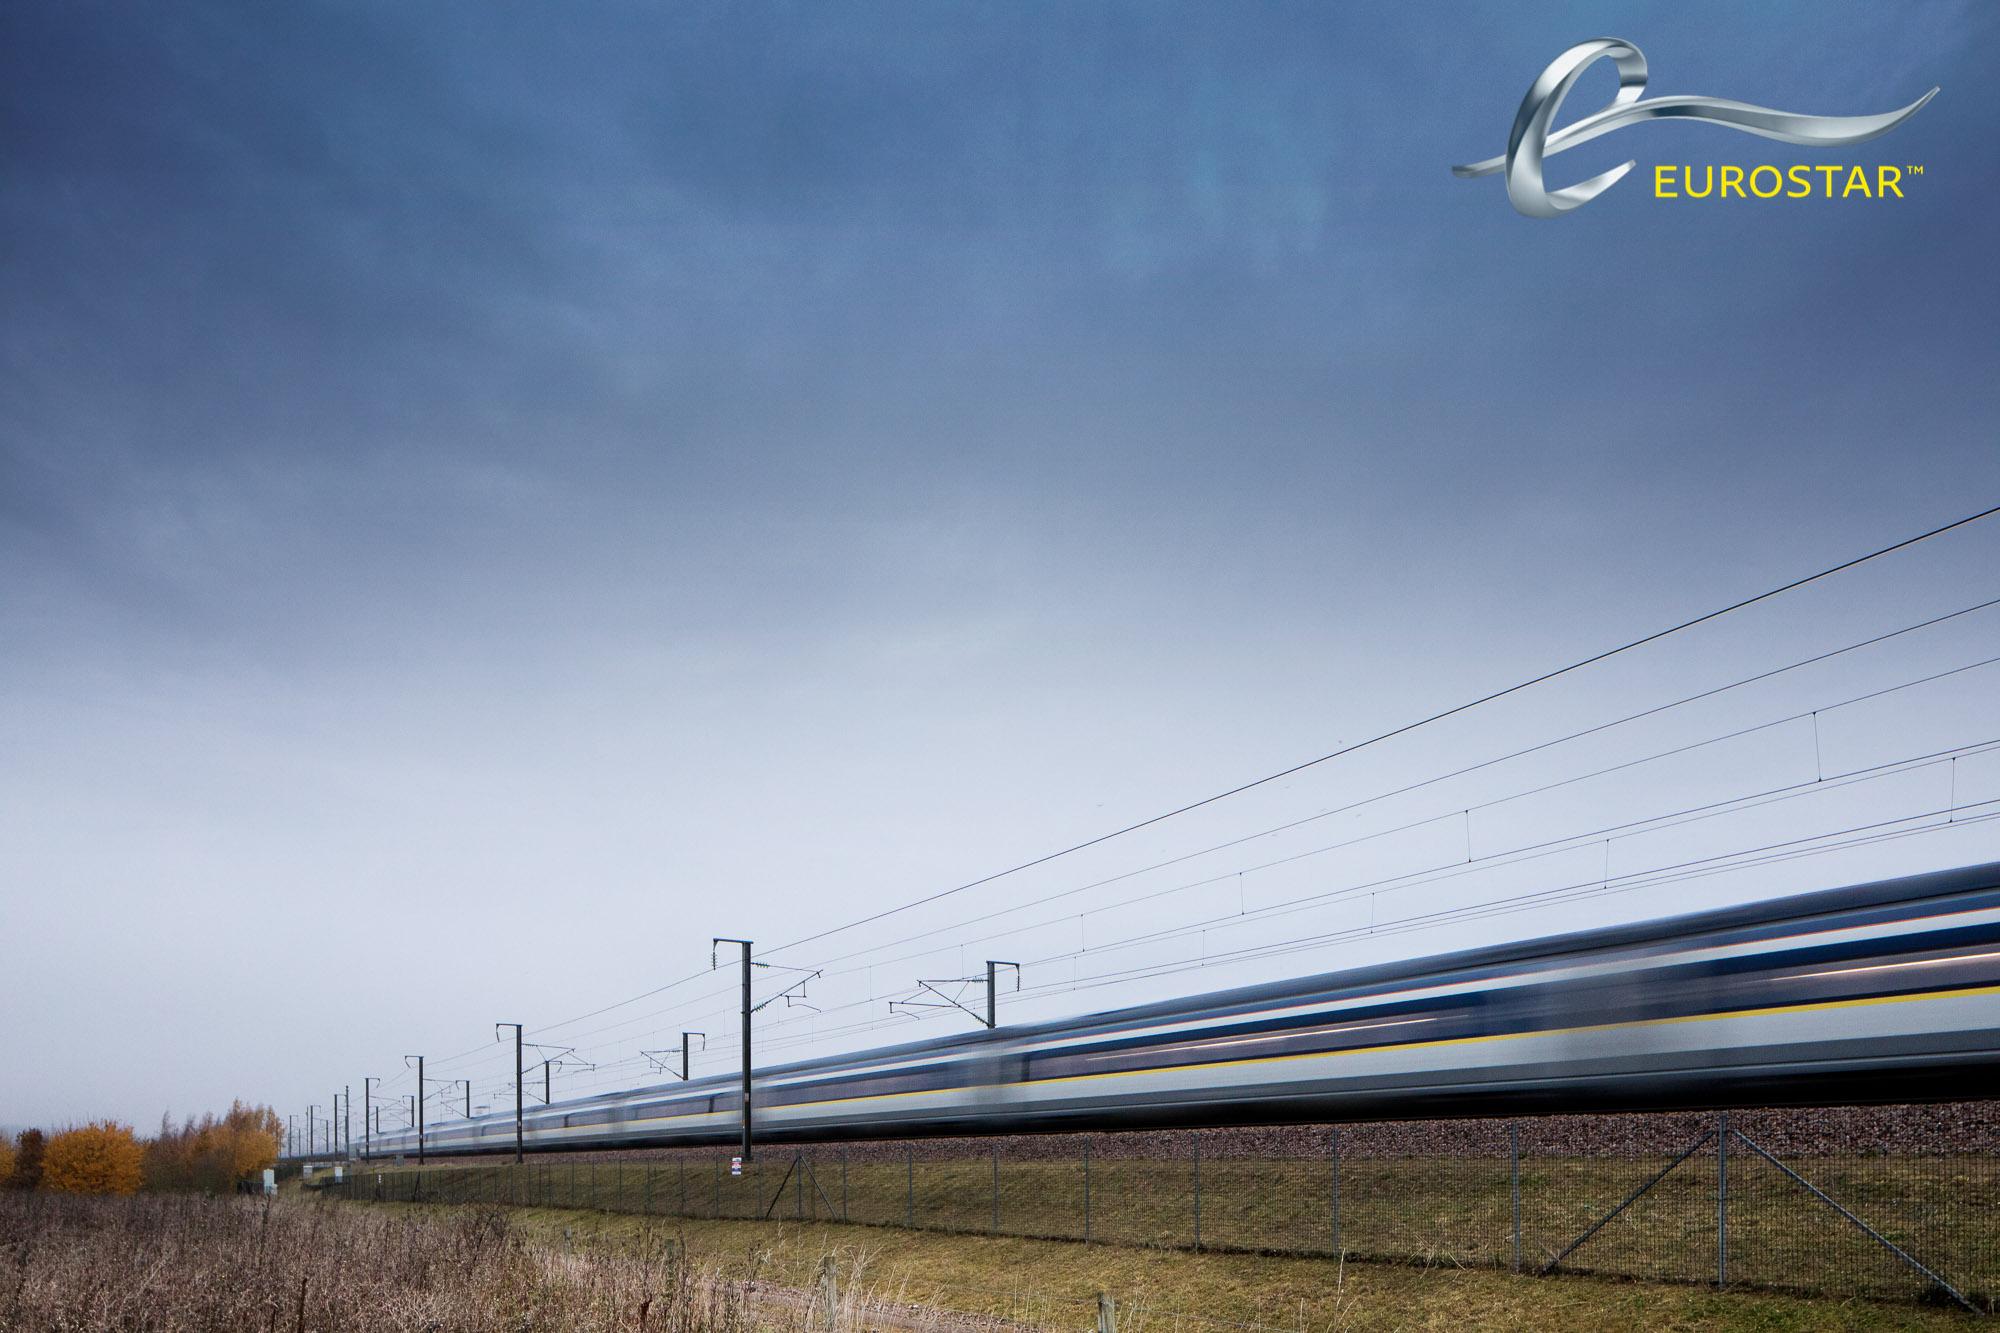 171116_Eurostar_Verbatim_053_R (1).jpg